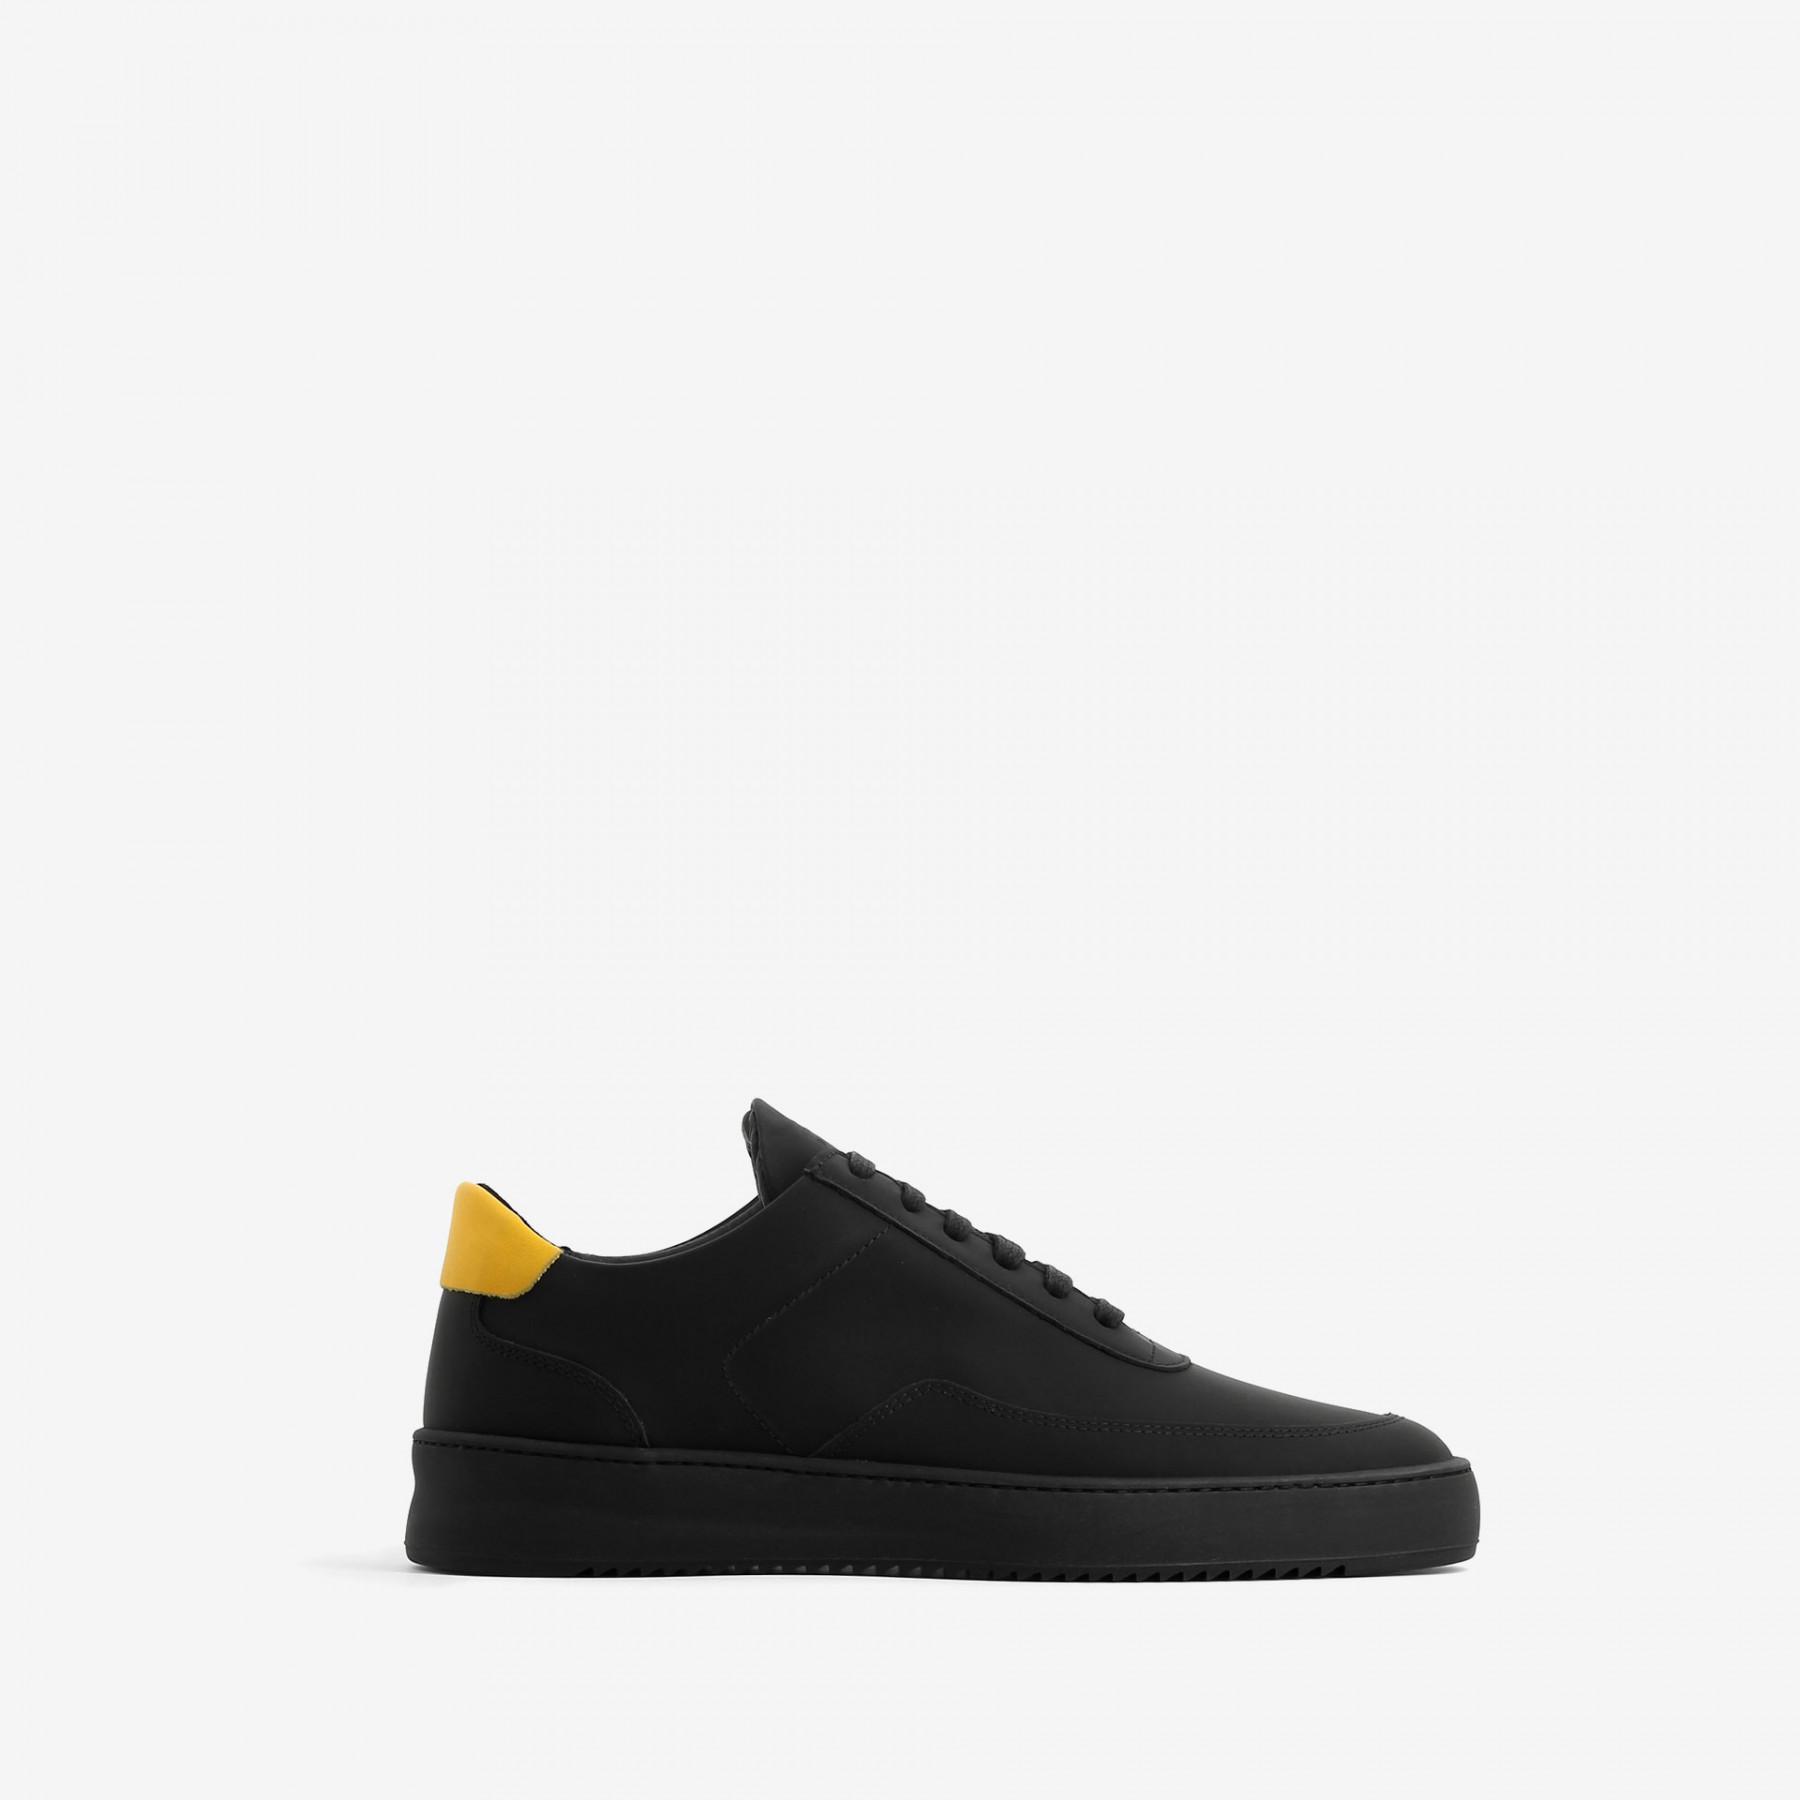 Filling Pieces Black & Yellow Low Mondo Ripple Sneakers vziXhFHzX